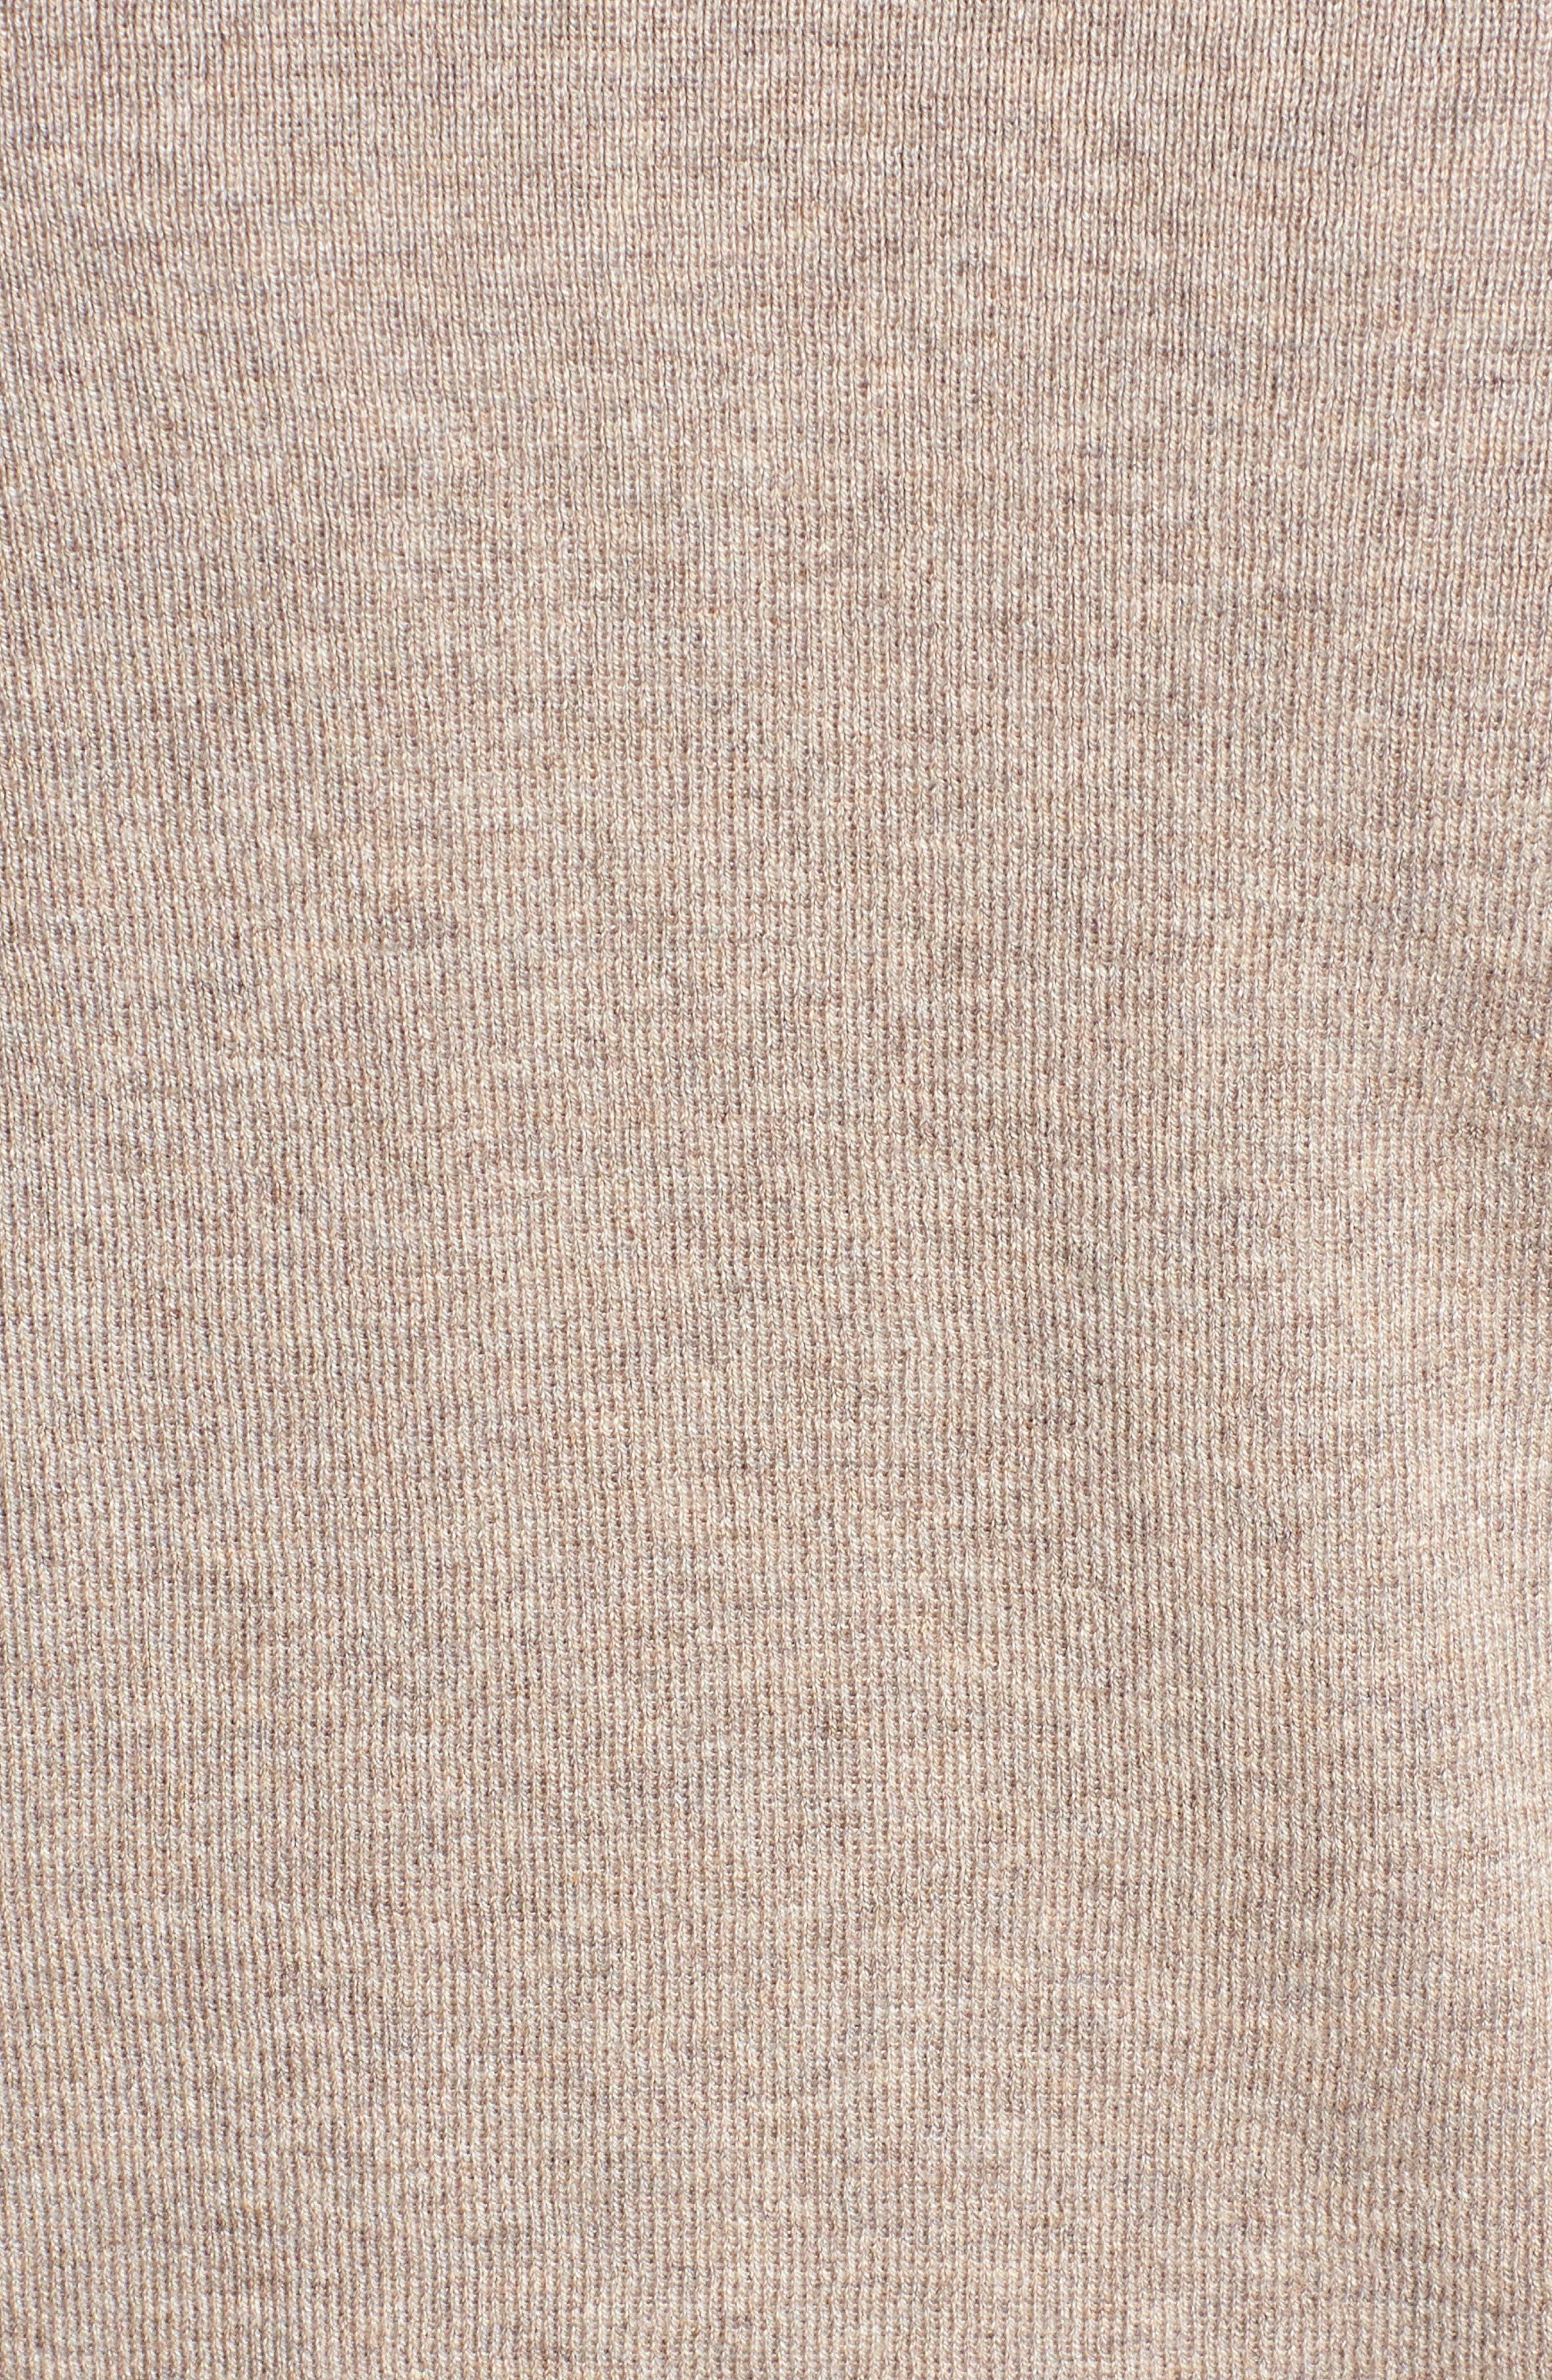 4-Way Convertible Lightweight Cardigan,                             Alternate thumbnail 423, color,